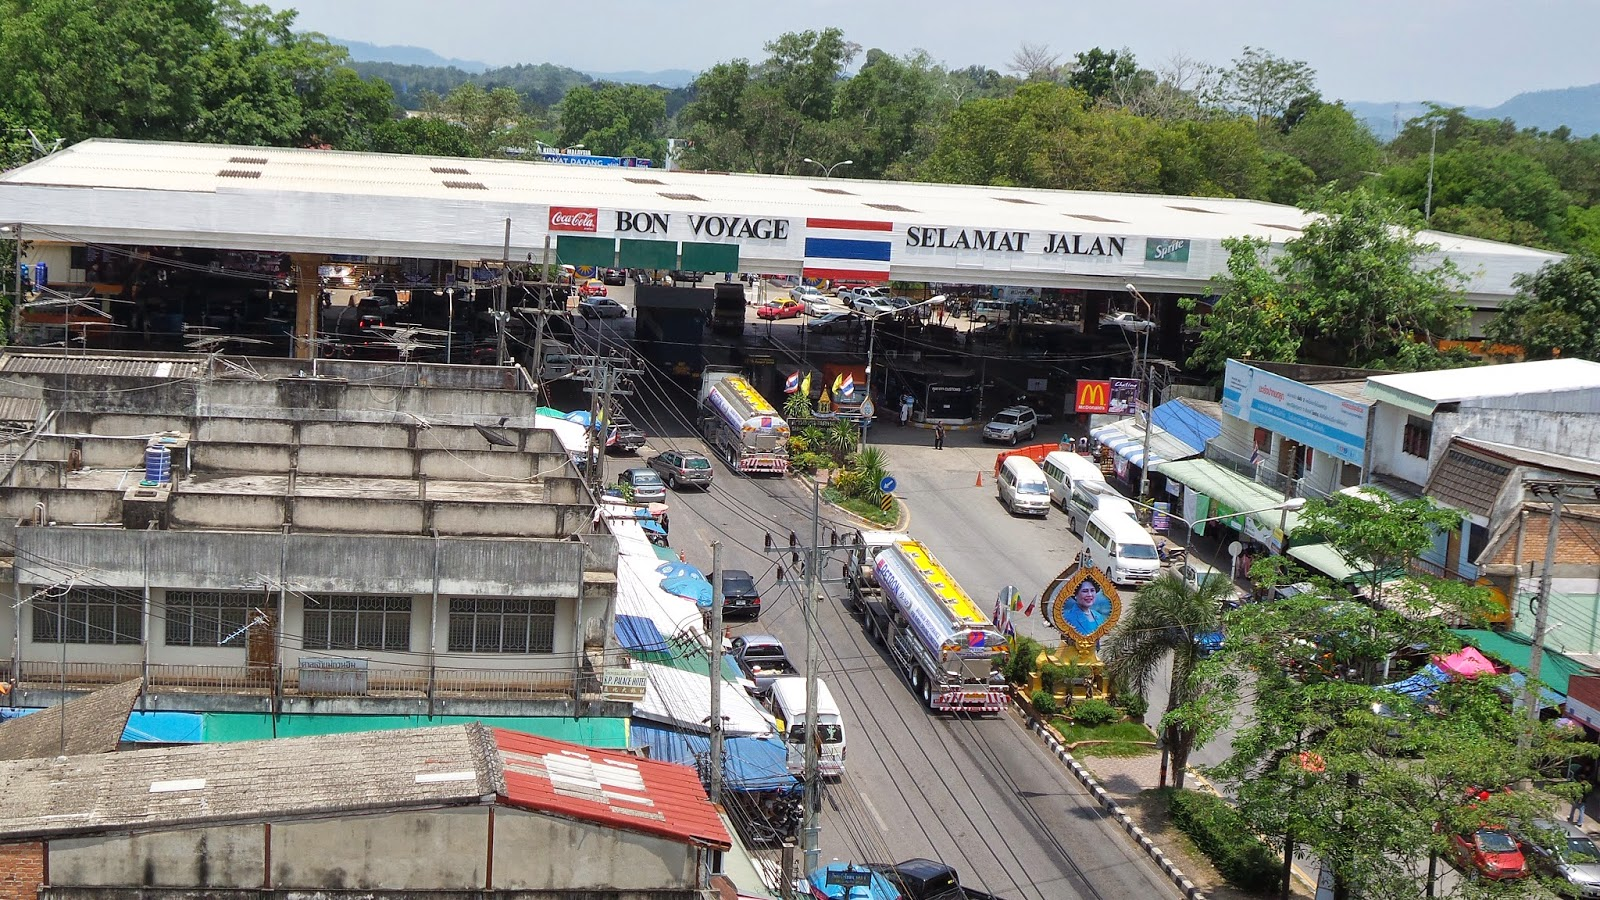 PROMO] 60% OFF Mbi Resort Danok Hatyai Thailand Cheap Hotels in